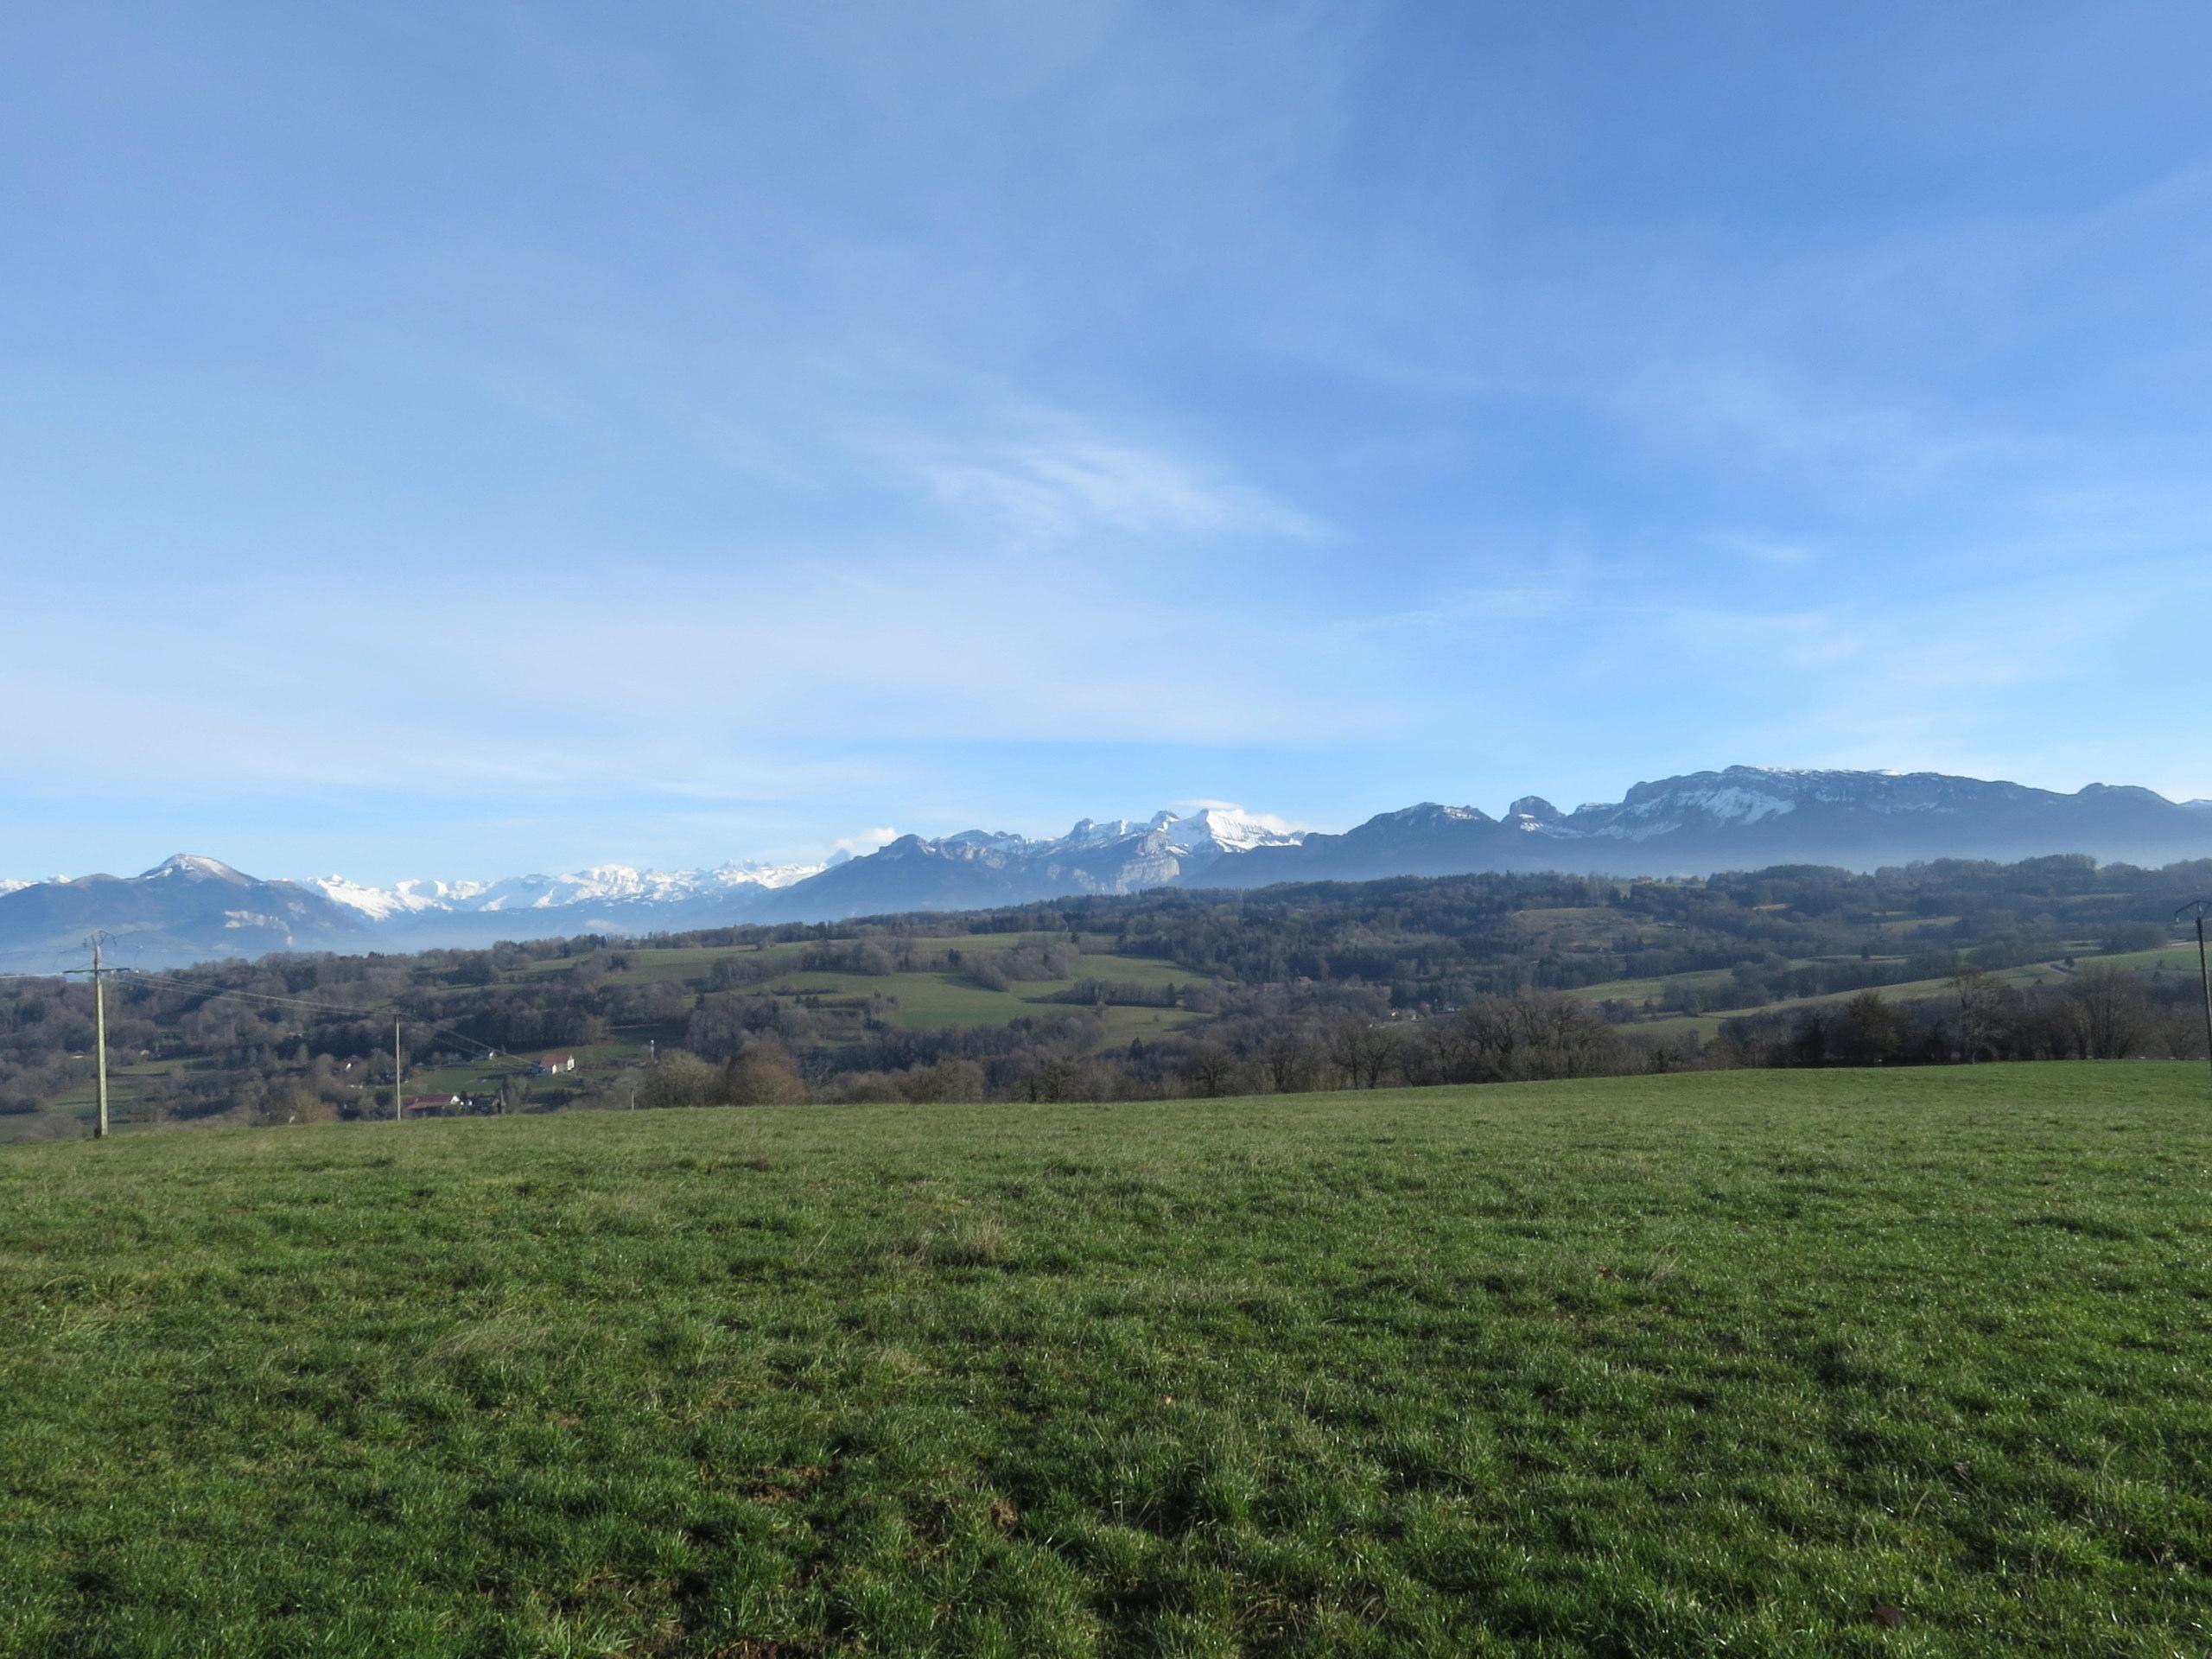 Balades canines: Pays de Gex/Jura/Genève ou Albertville (73) - Page 8 Img_3869